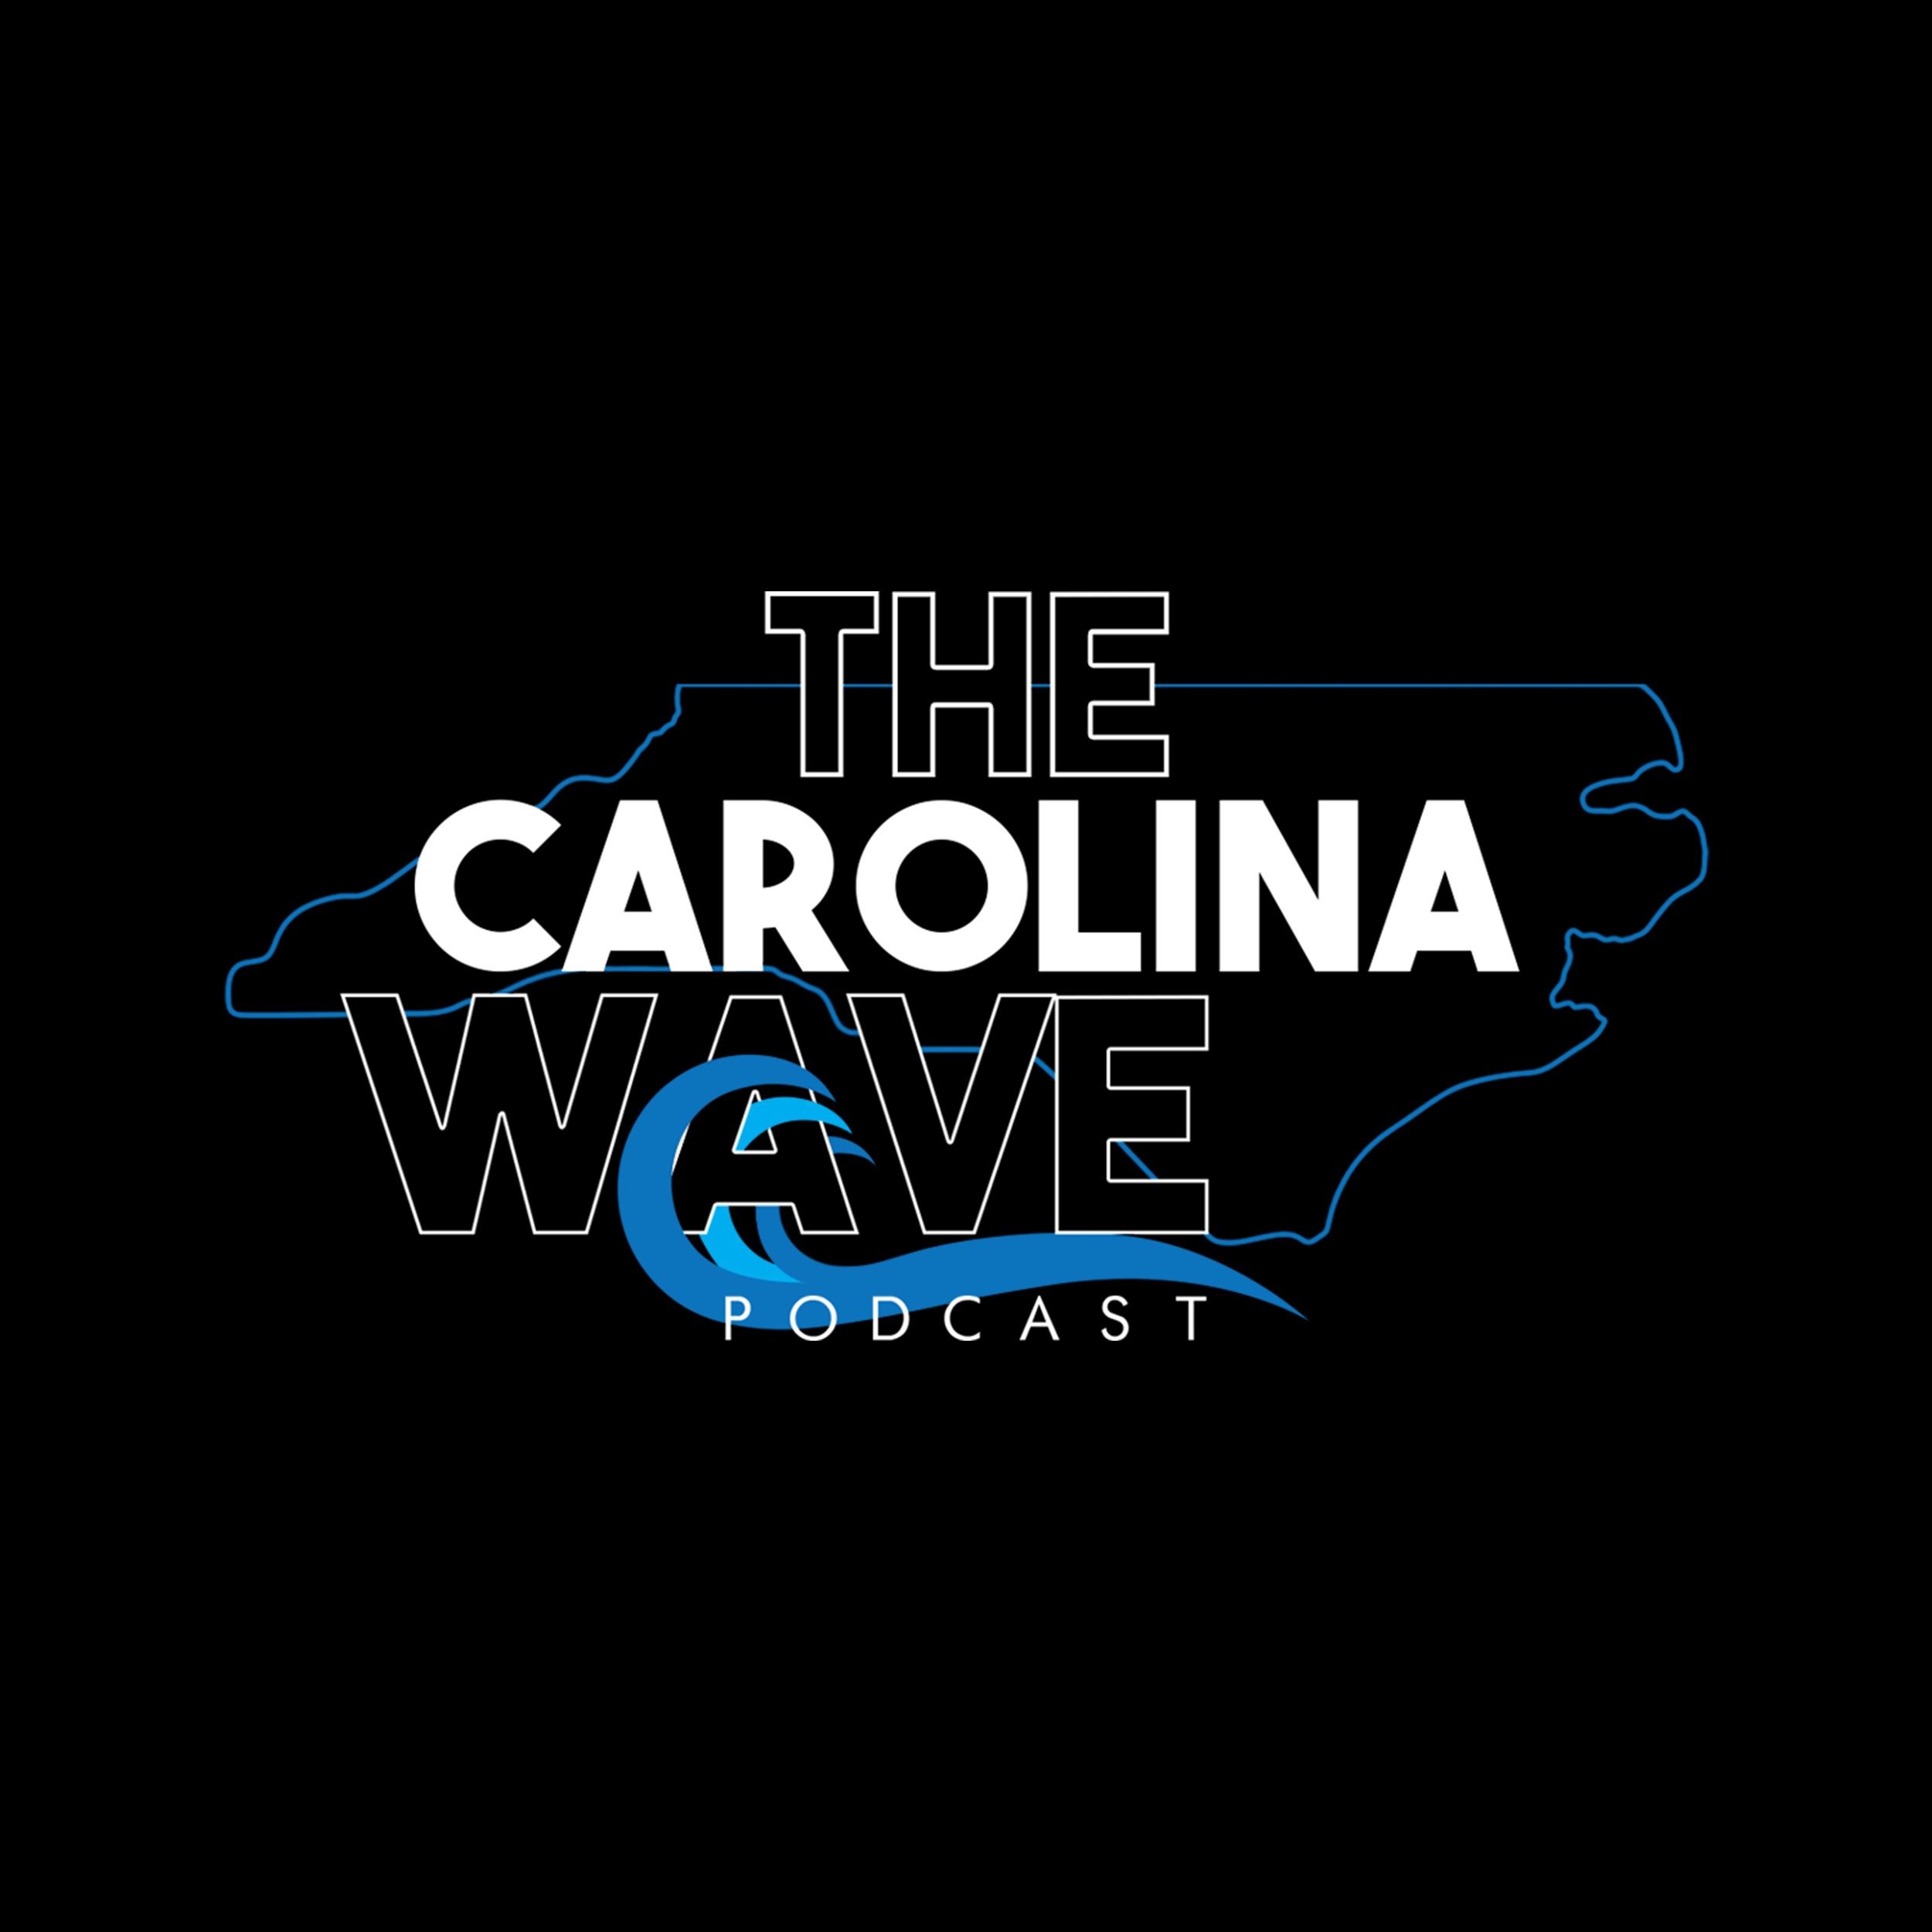 The Carolina Wave Podcast